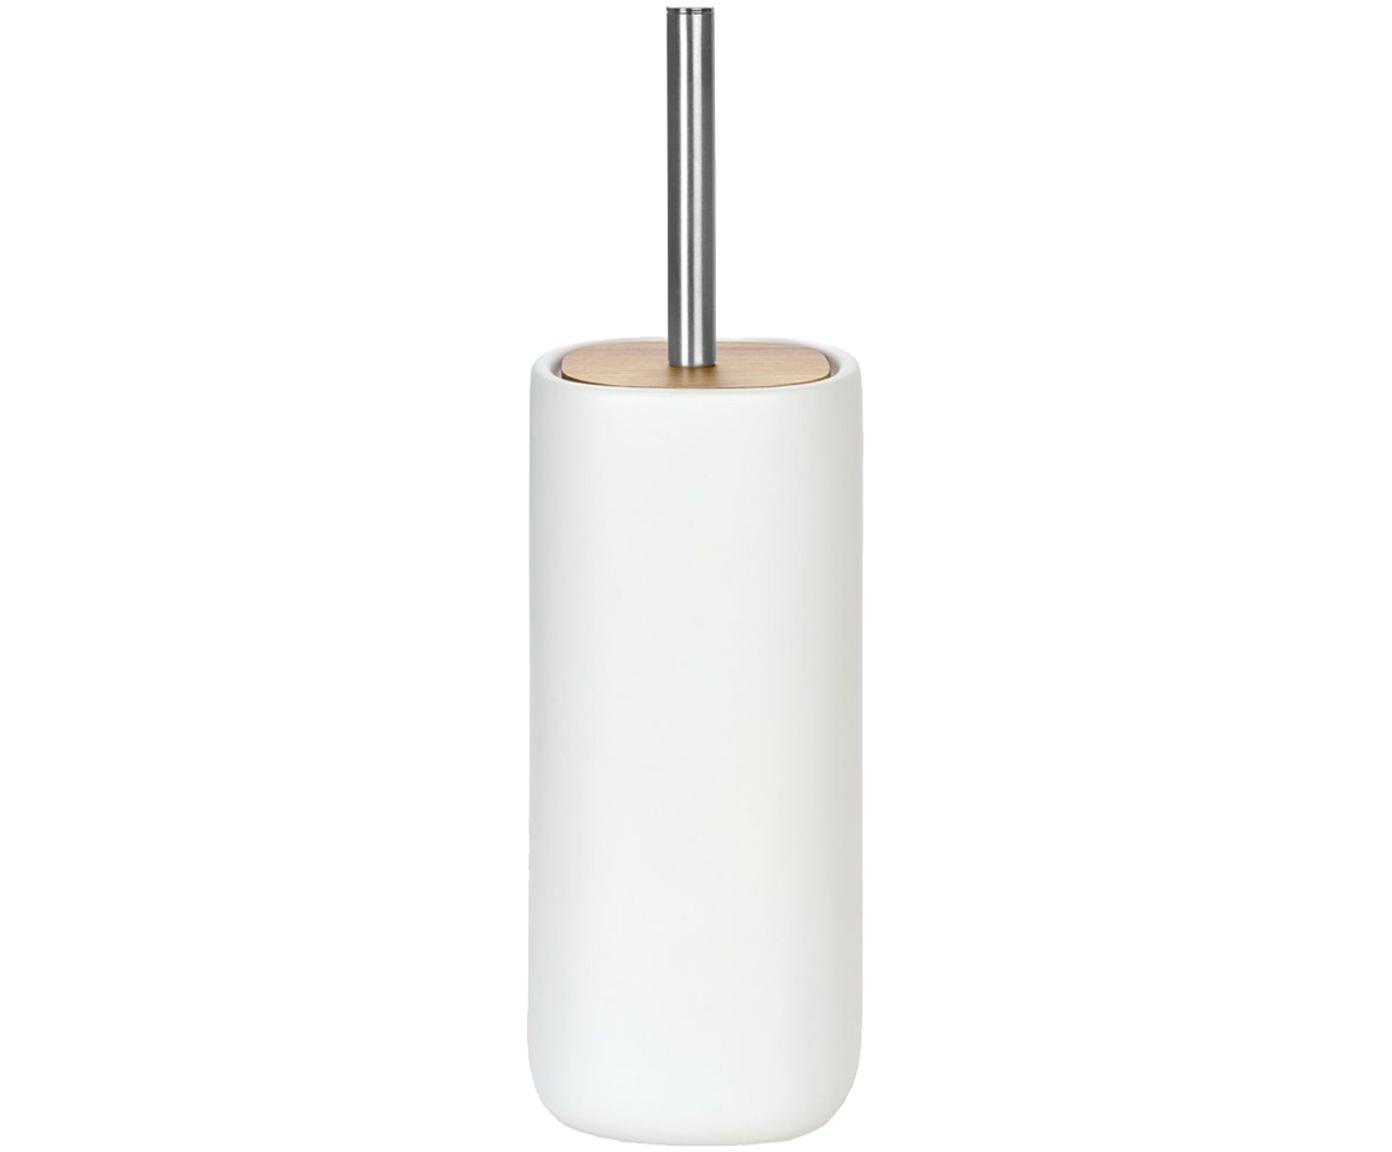 Toiletborstel Wili met acaciahouten deksel, Houder: keramiek, Wit, acaciahoutkleurig, Ø 11 x H 37 cm